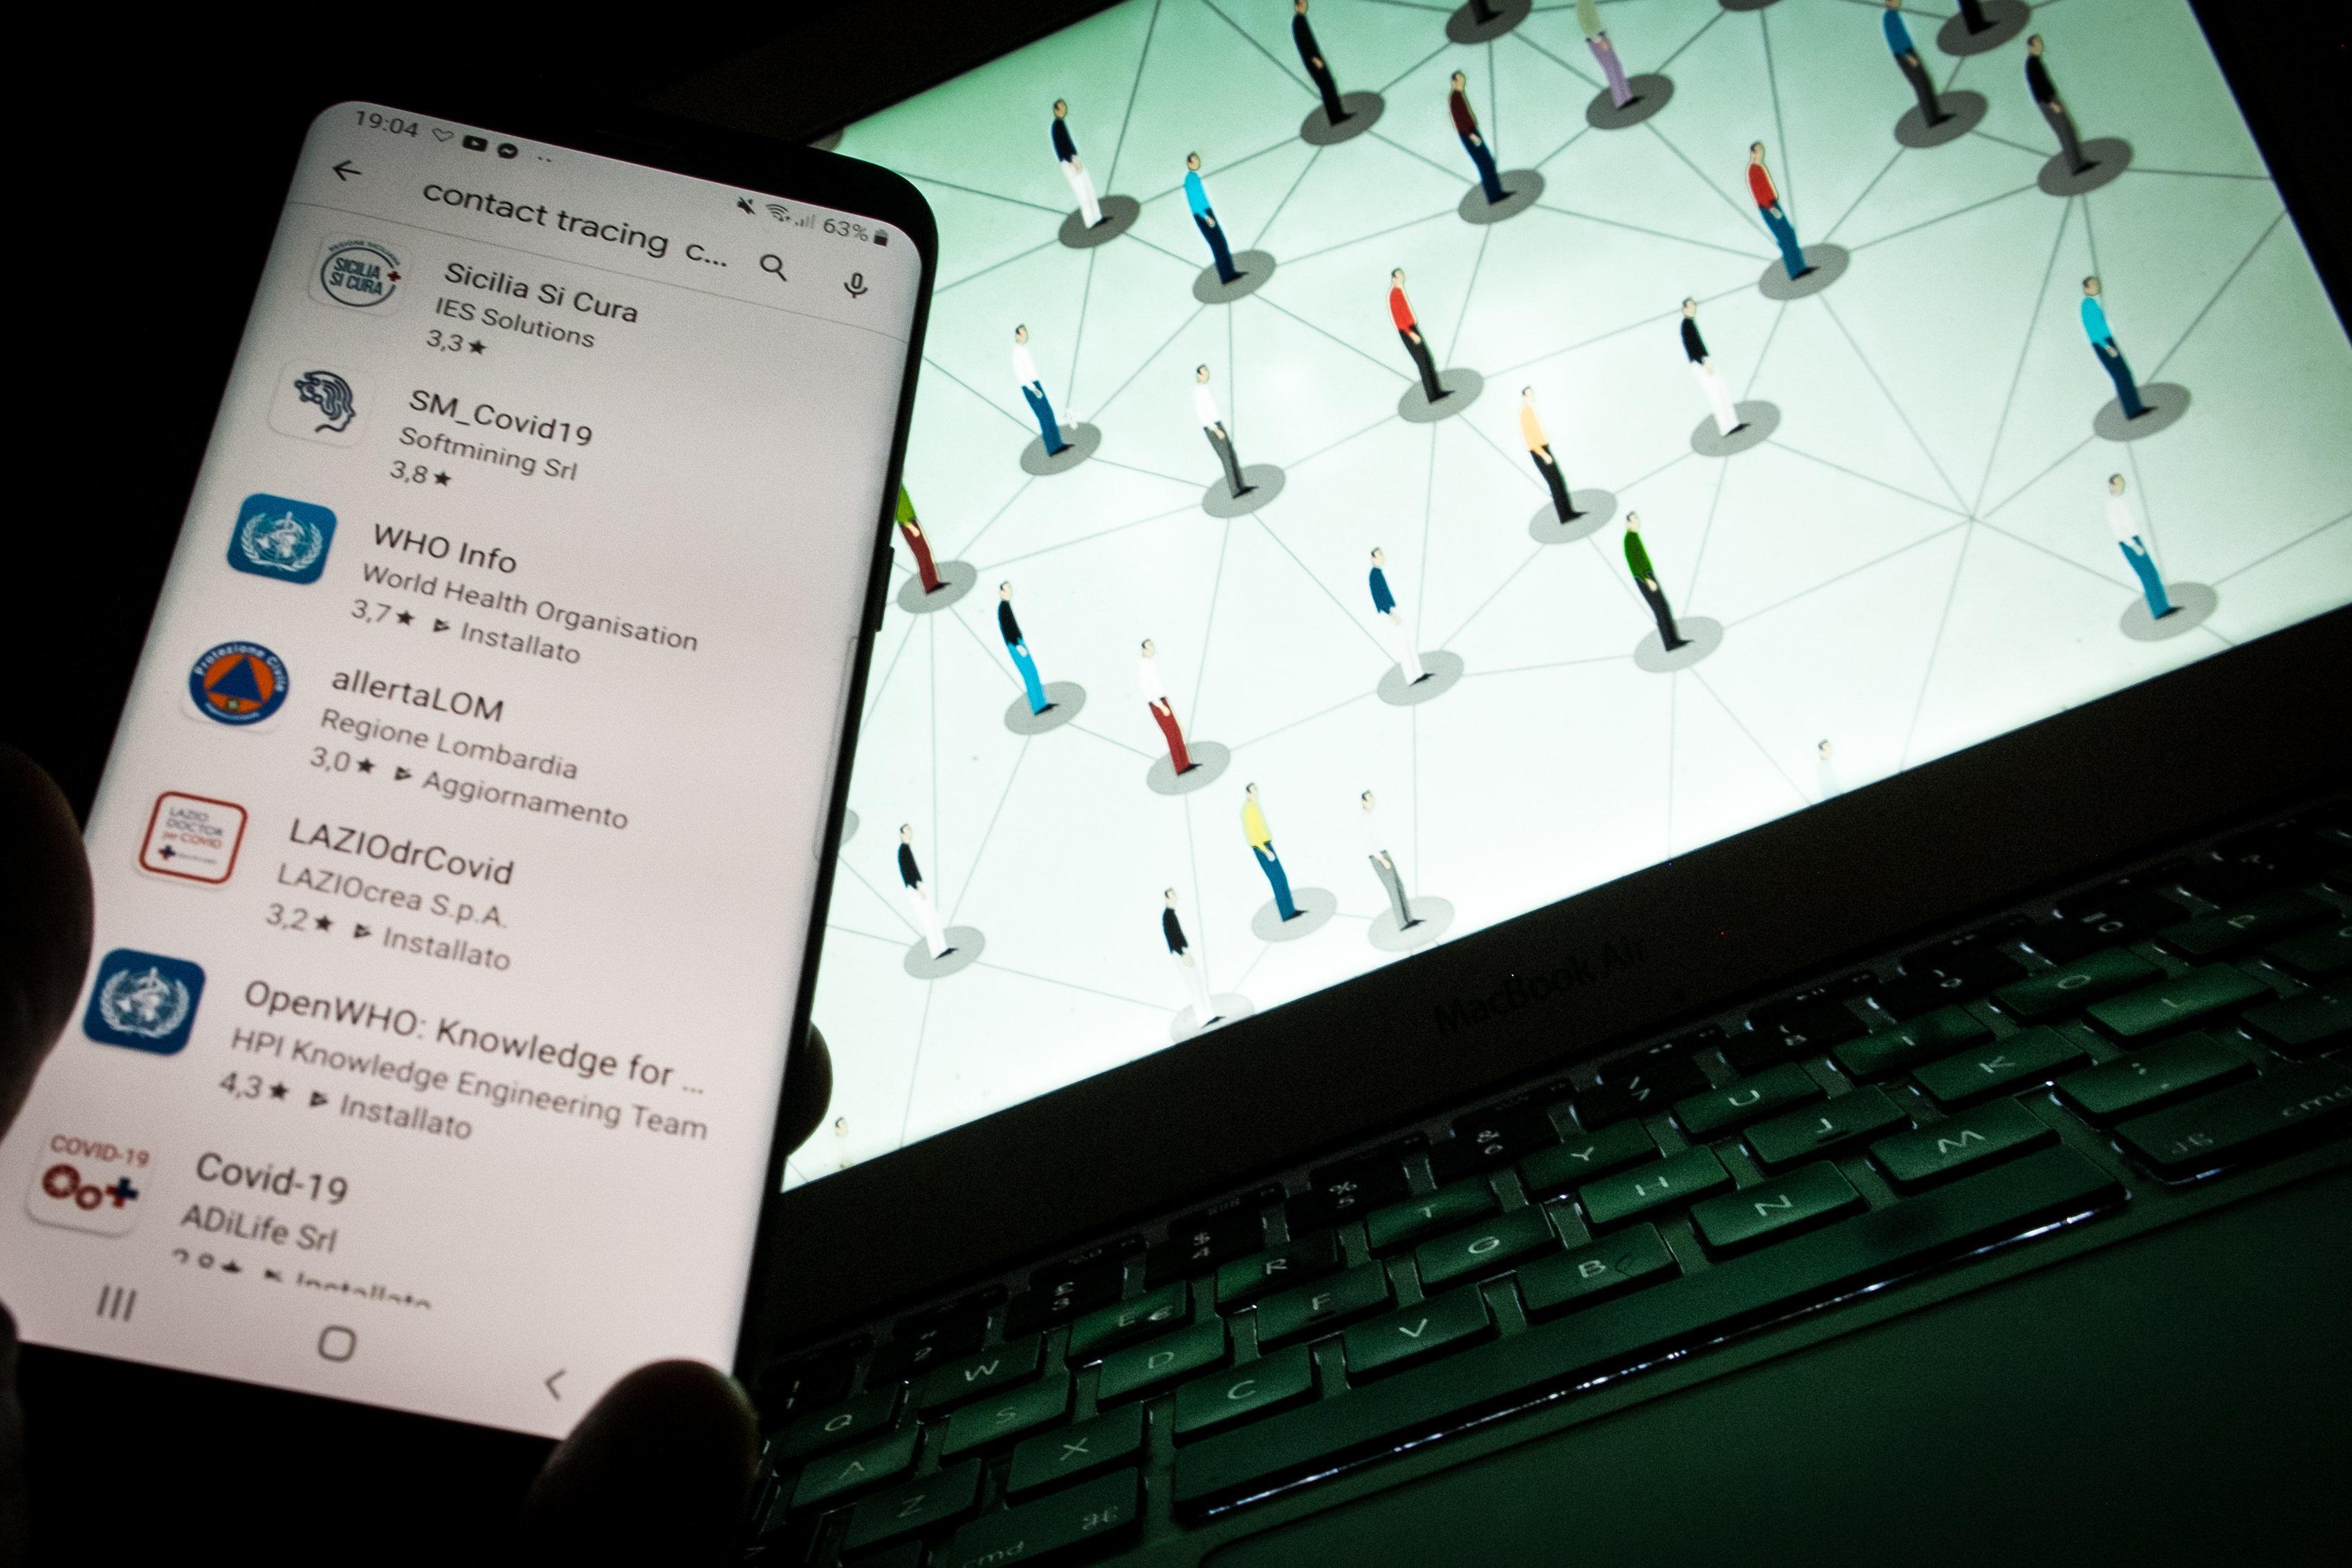 Corona-Warn-App: Bundesregierung prüft drei Modelle